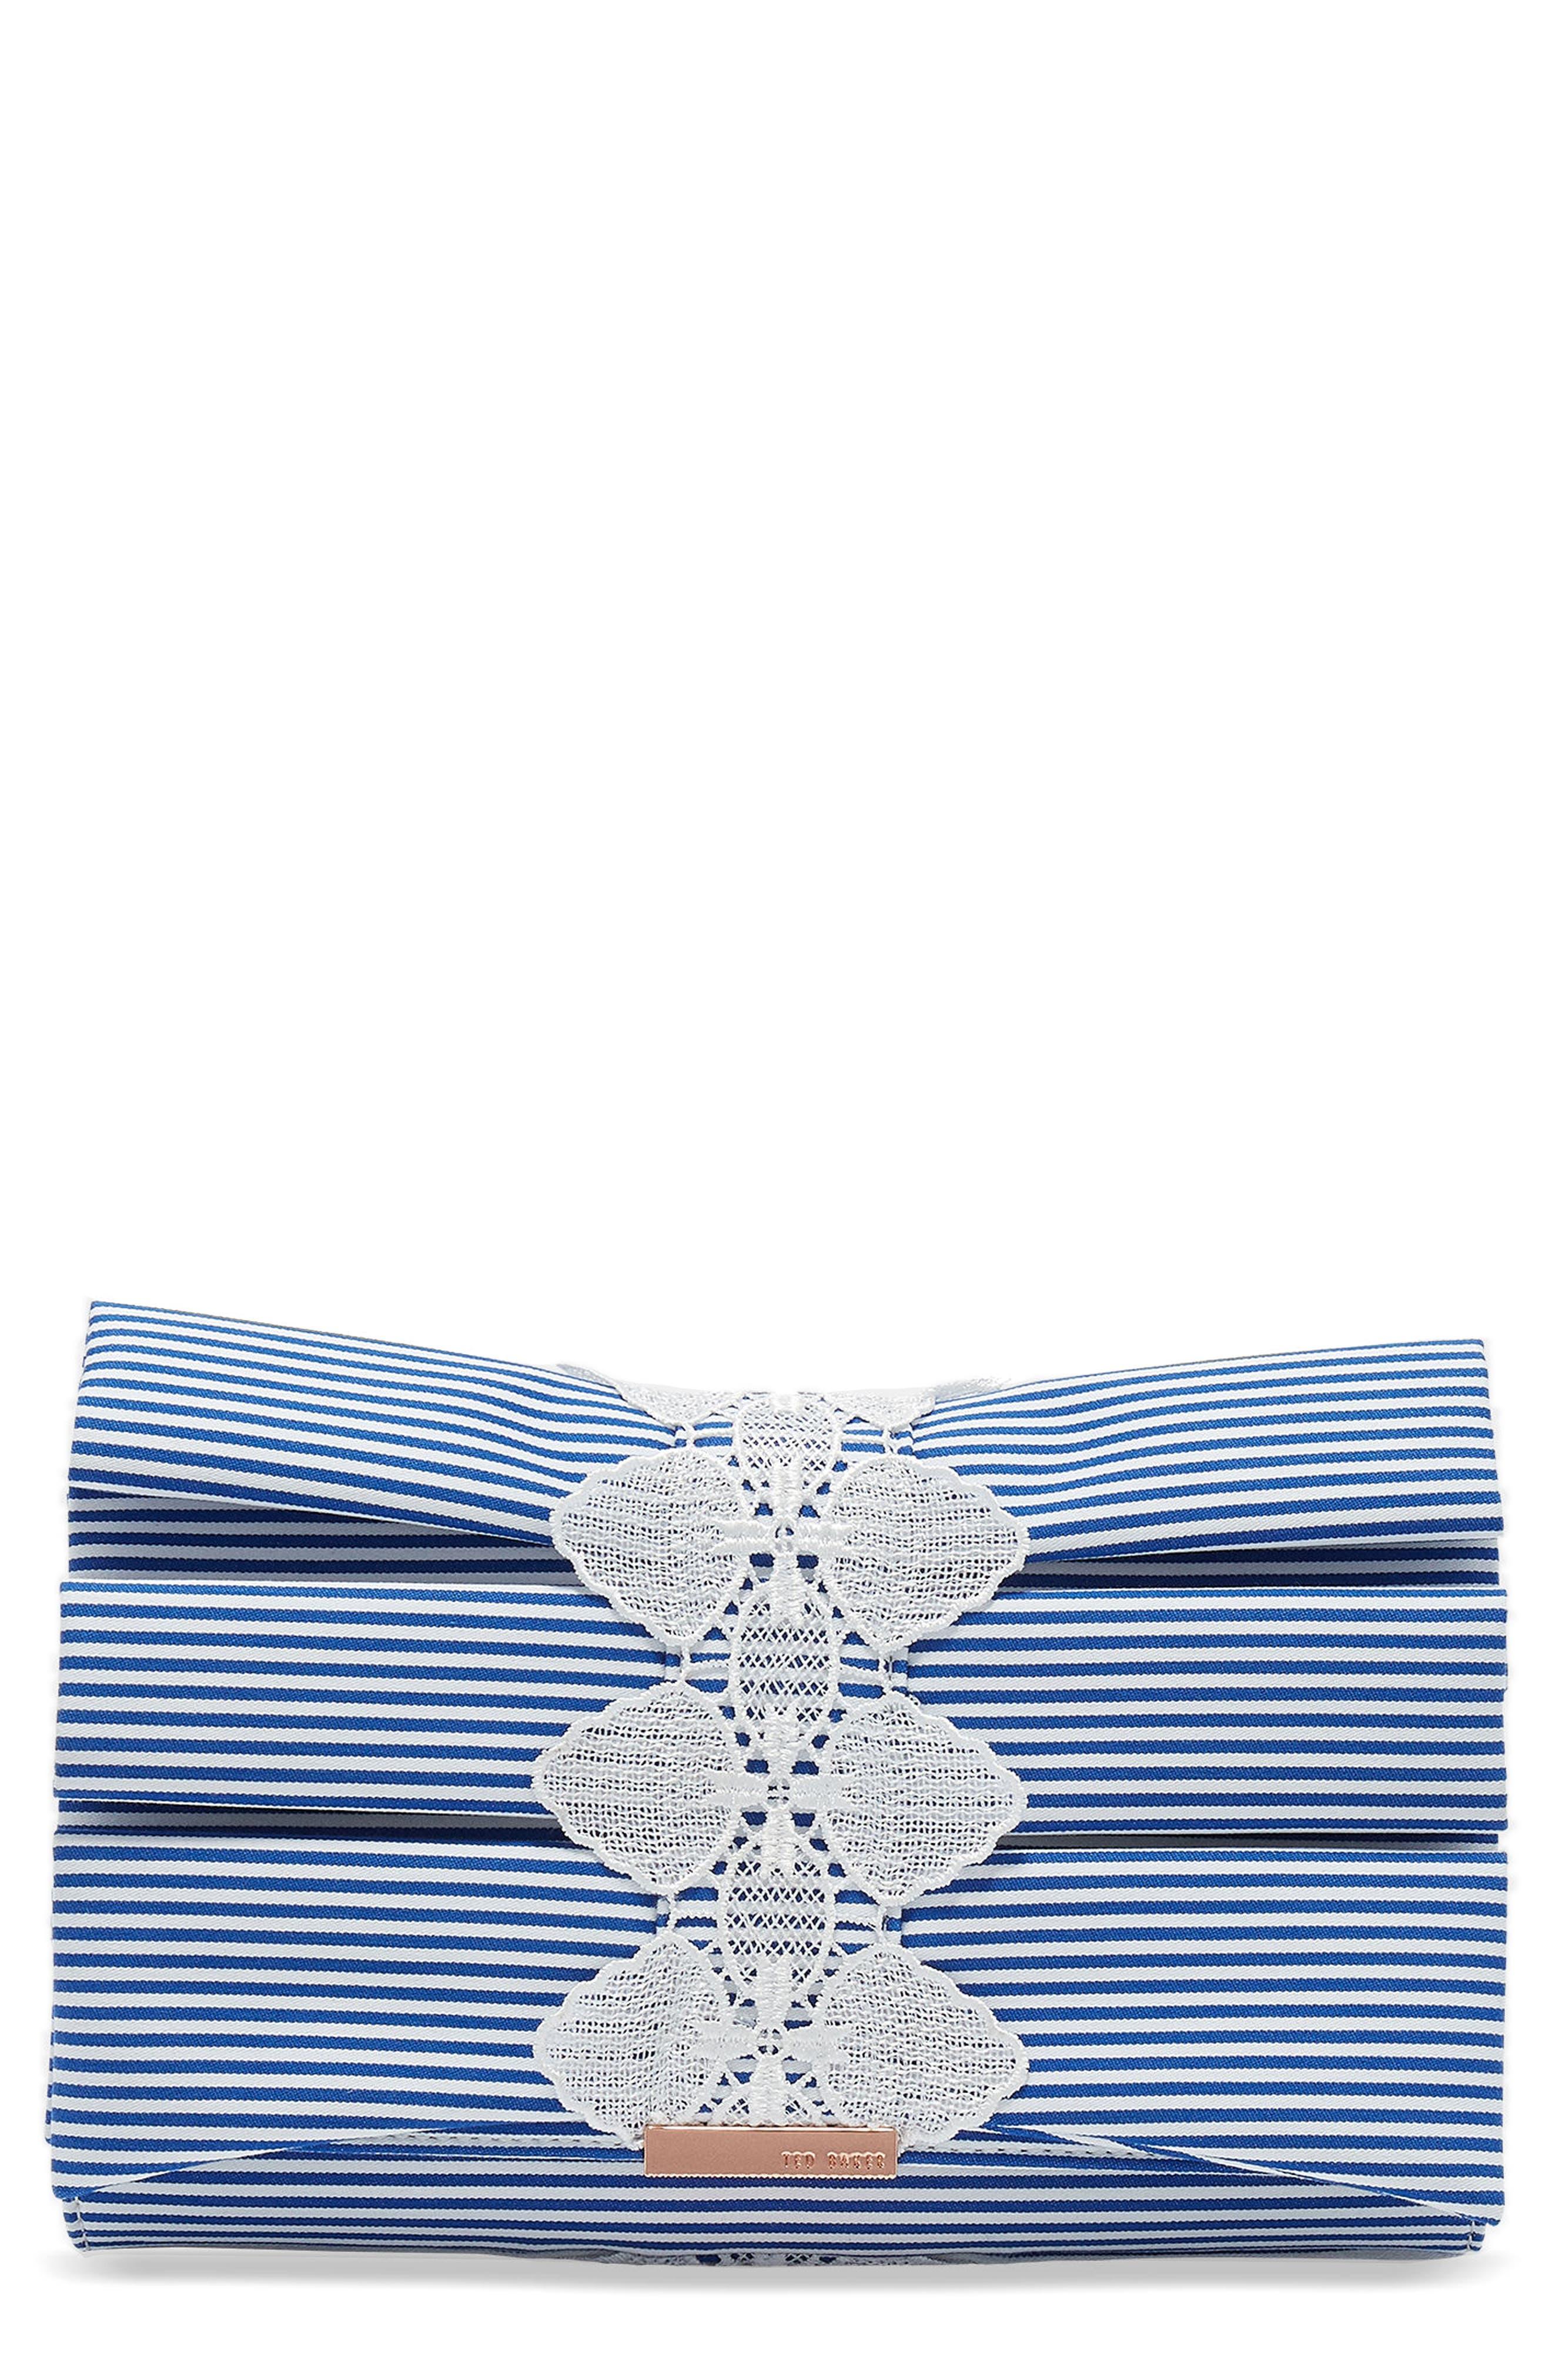 Box Pleat Evening Bag,                         Main,                         color, White